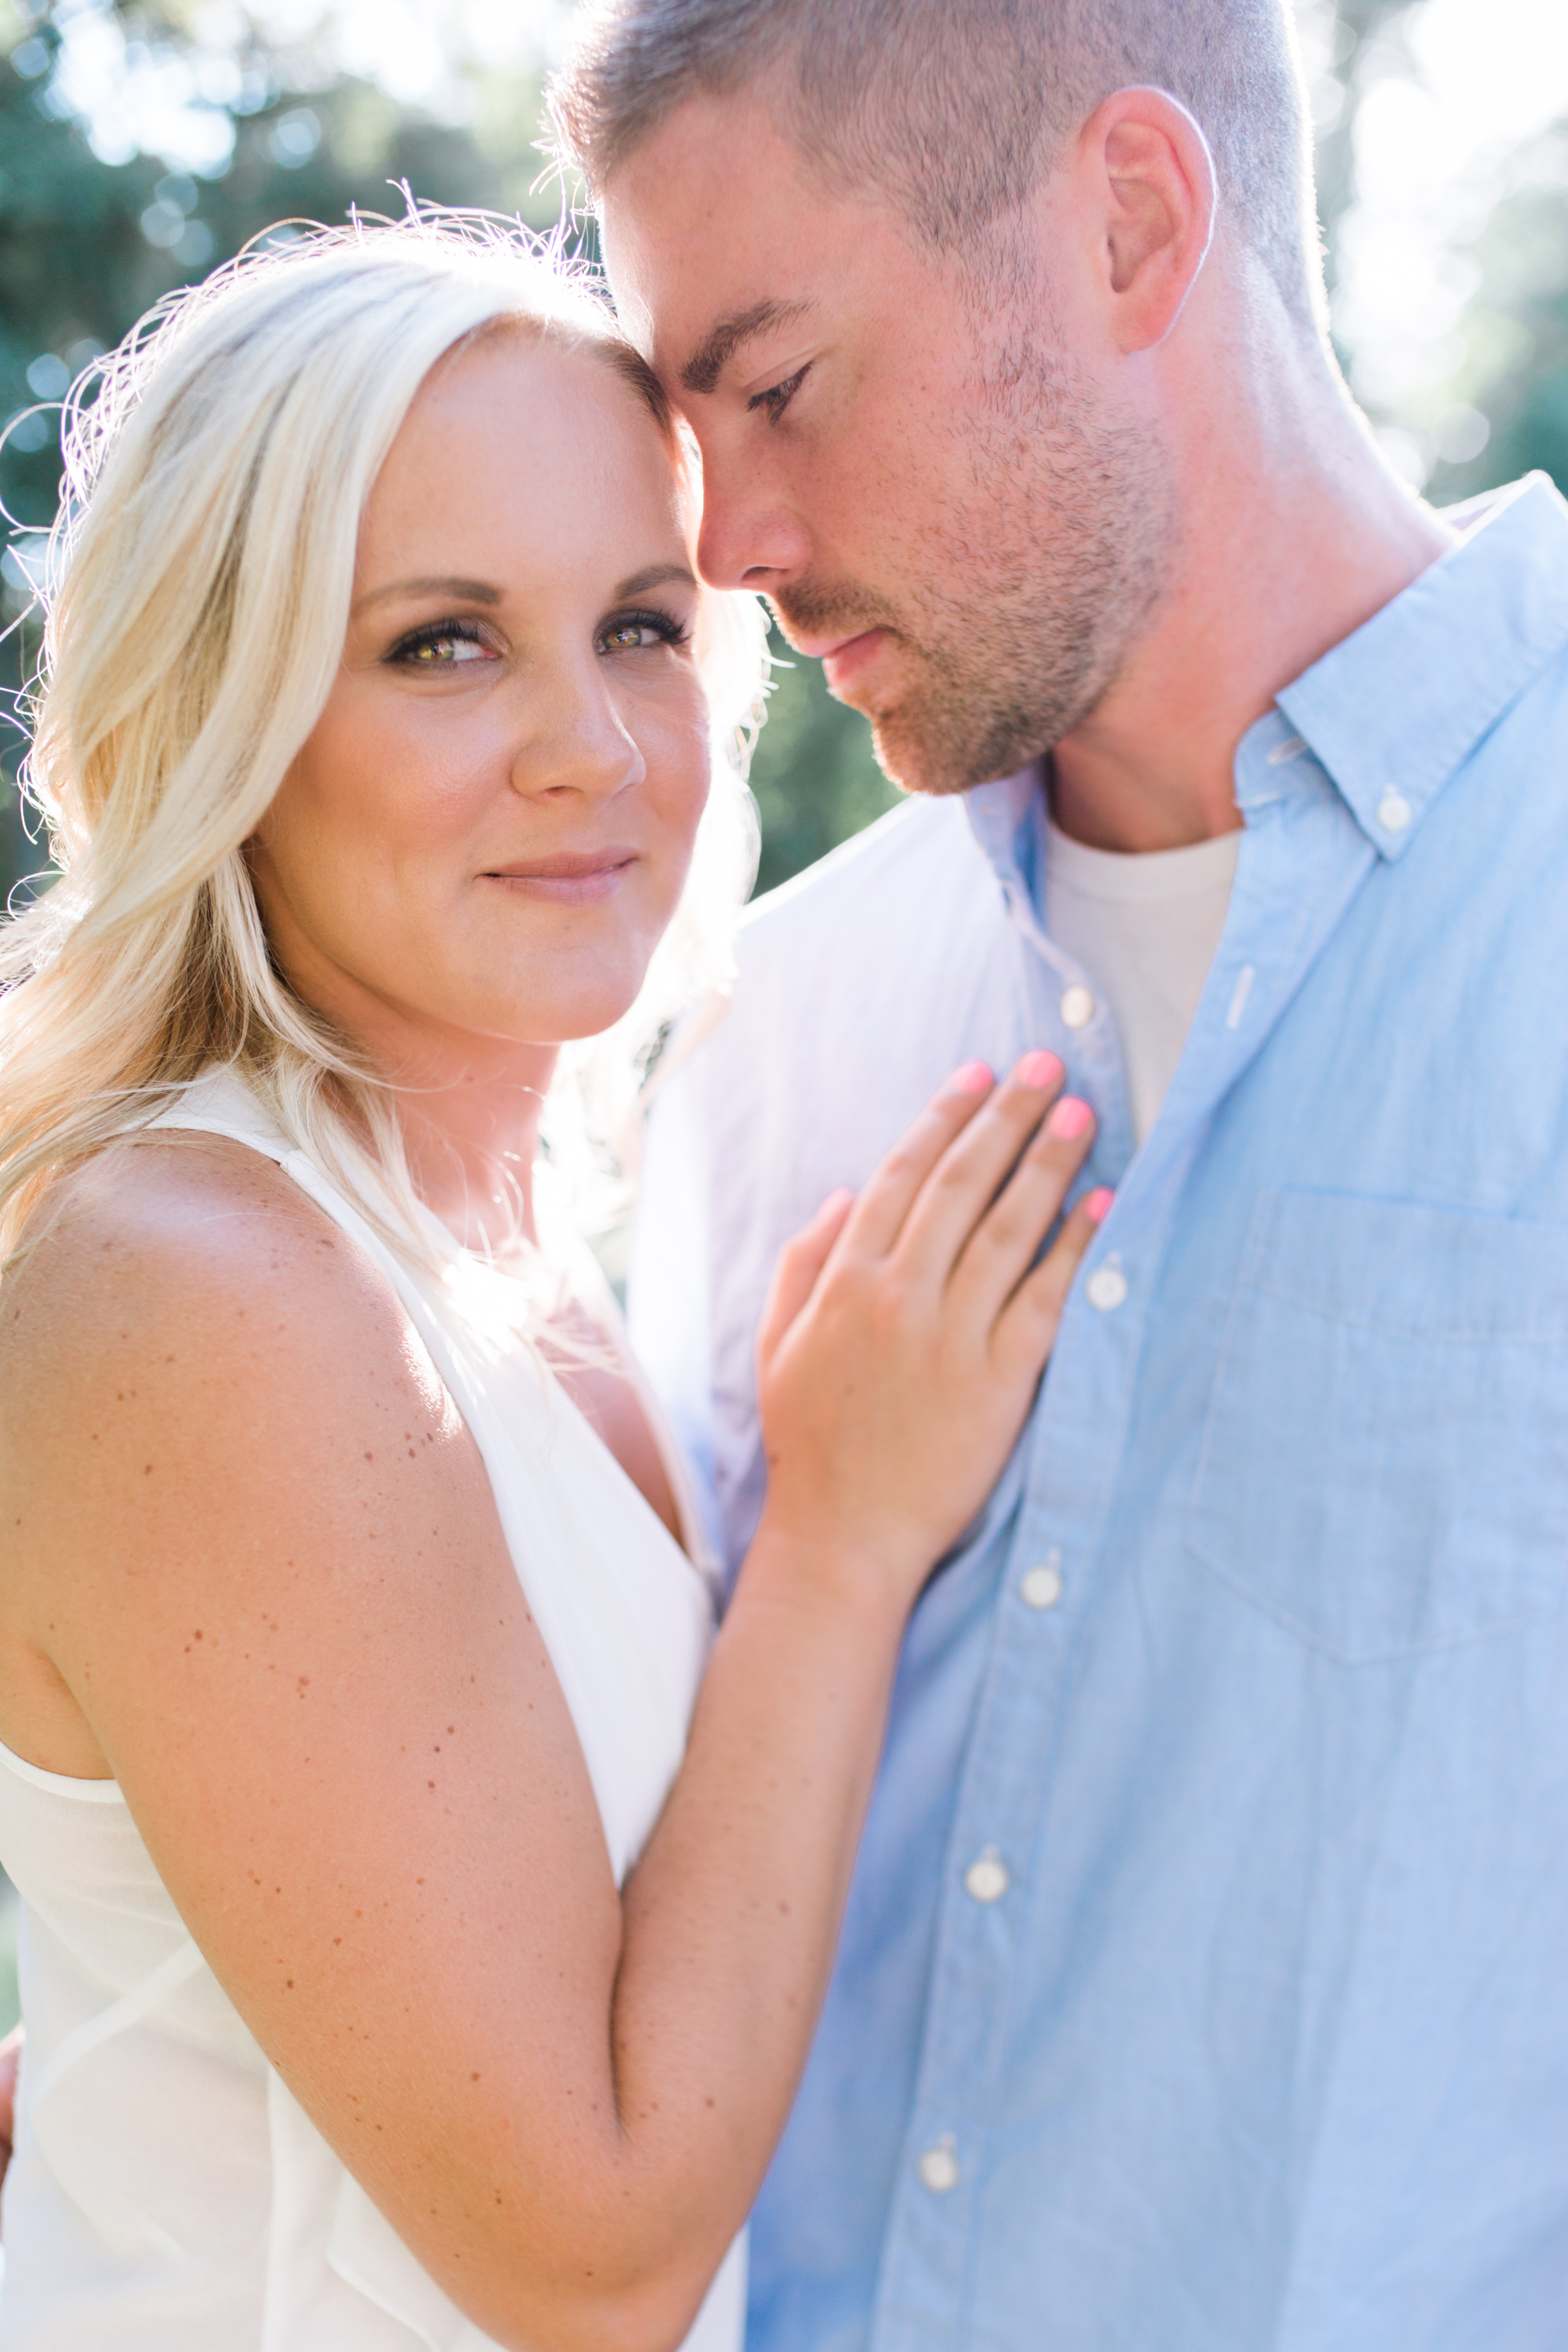 Kari and Tom, a Love Story